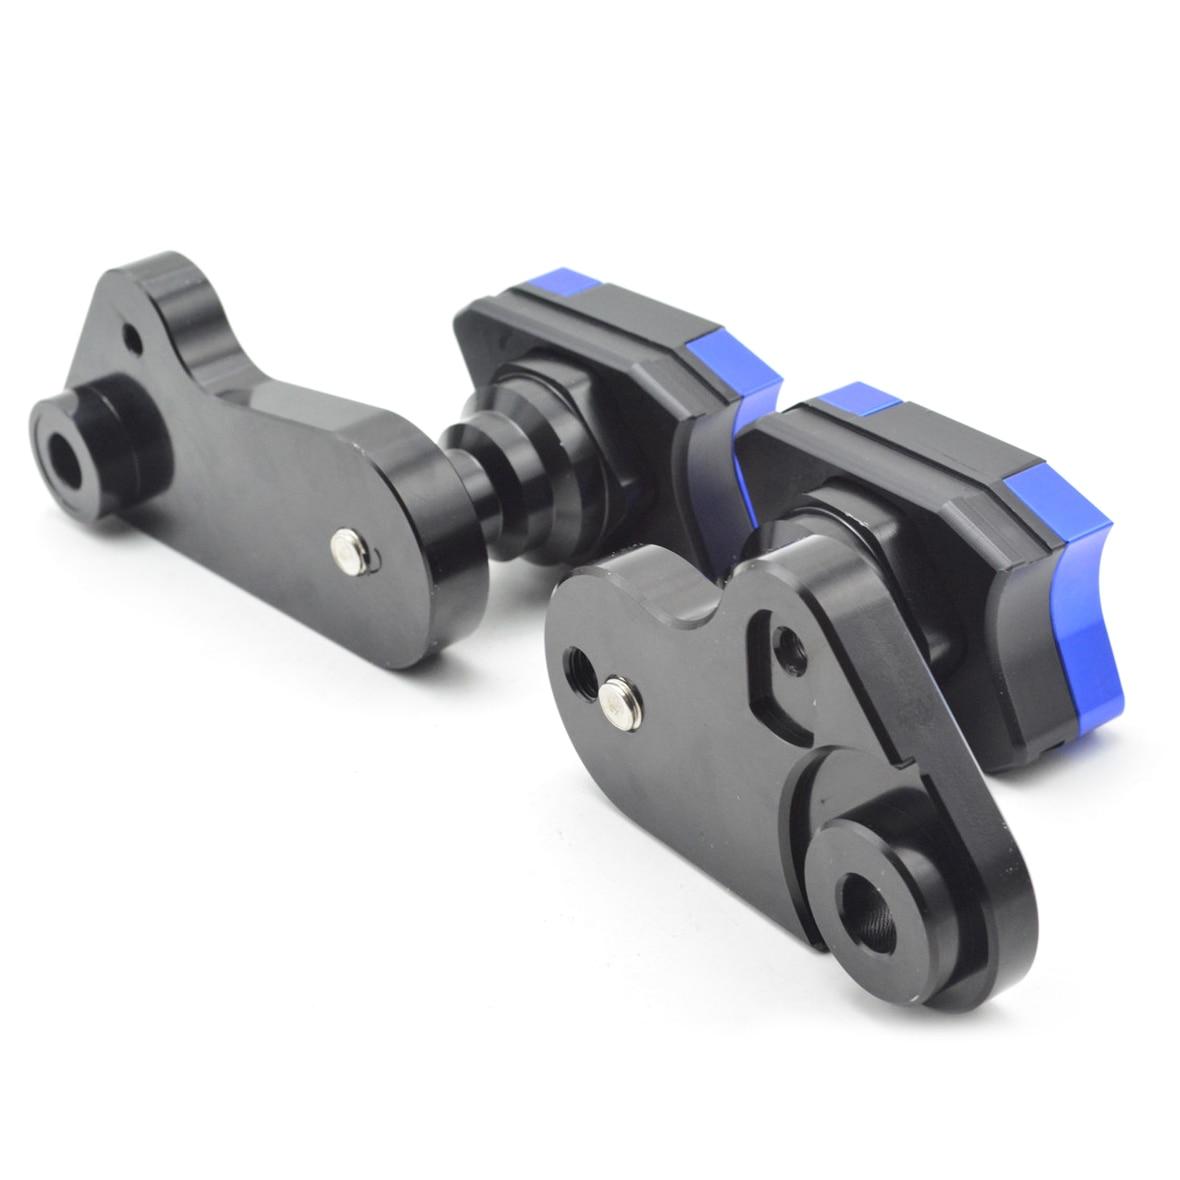 CNC Motorcycle Frame Slider Crash Pads Engine Case Sliders Protector For Yamaha YZF1000 R1 2009 2010 2011 2012 2013 2014